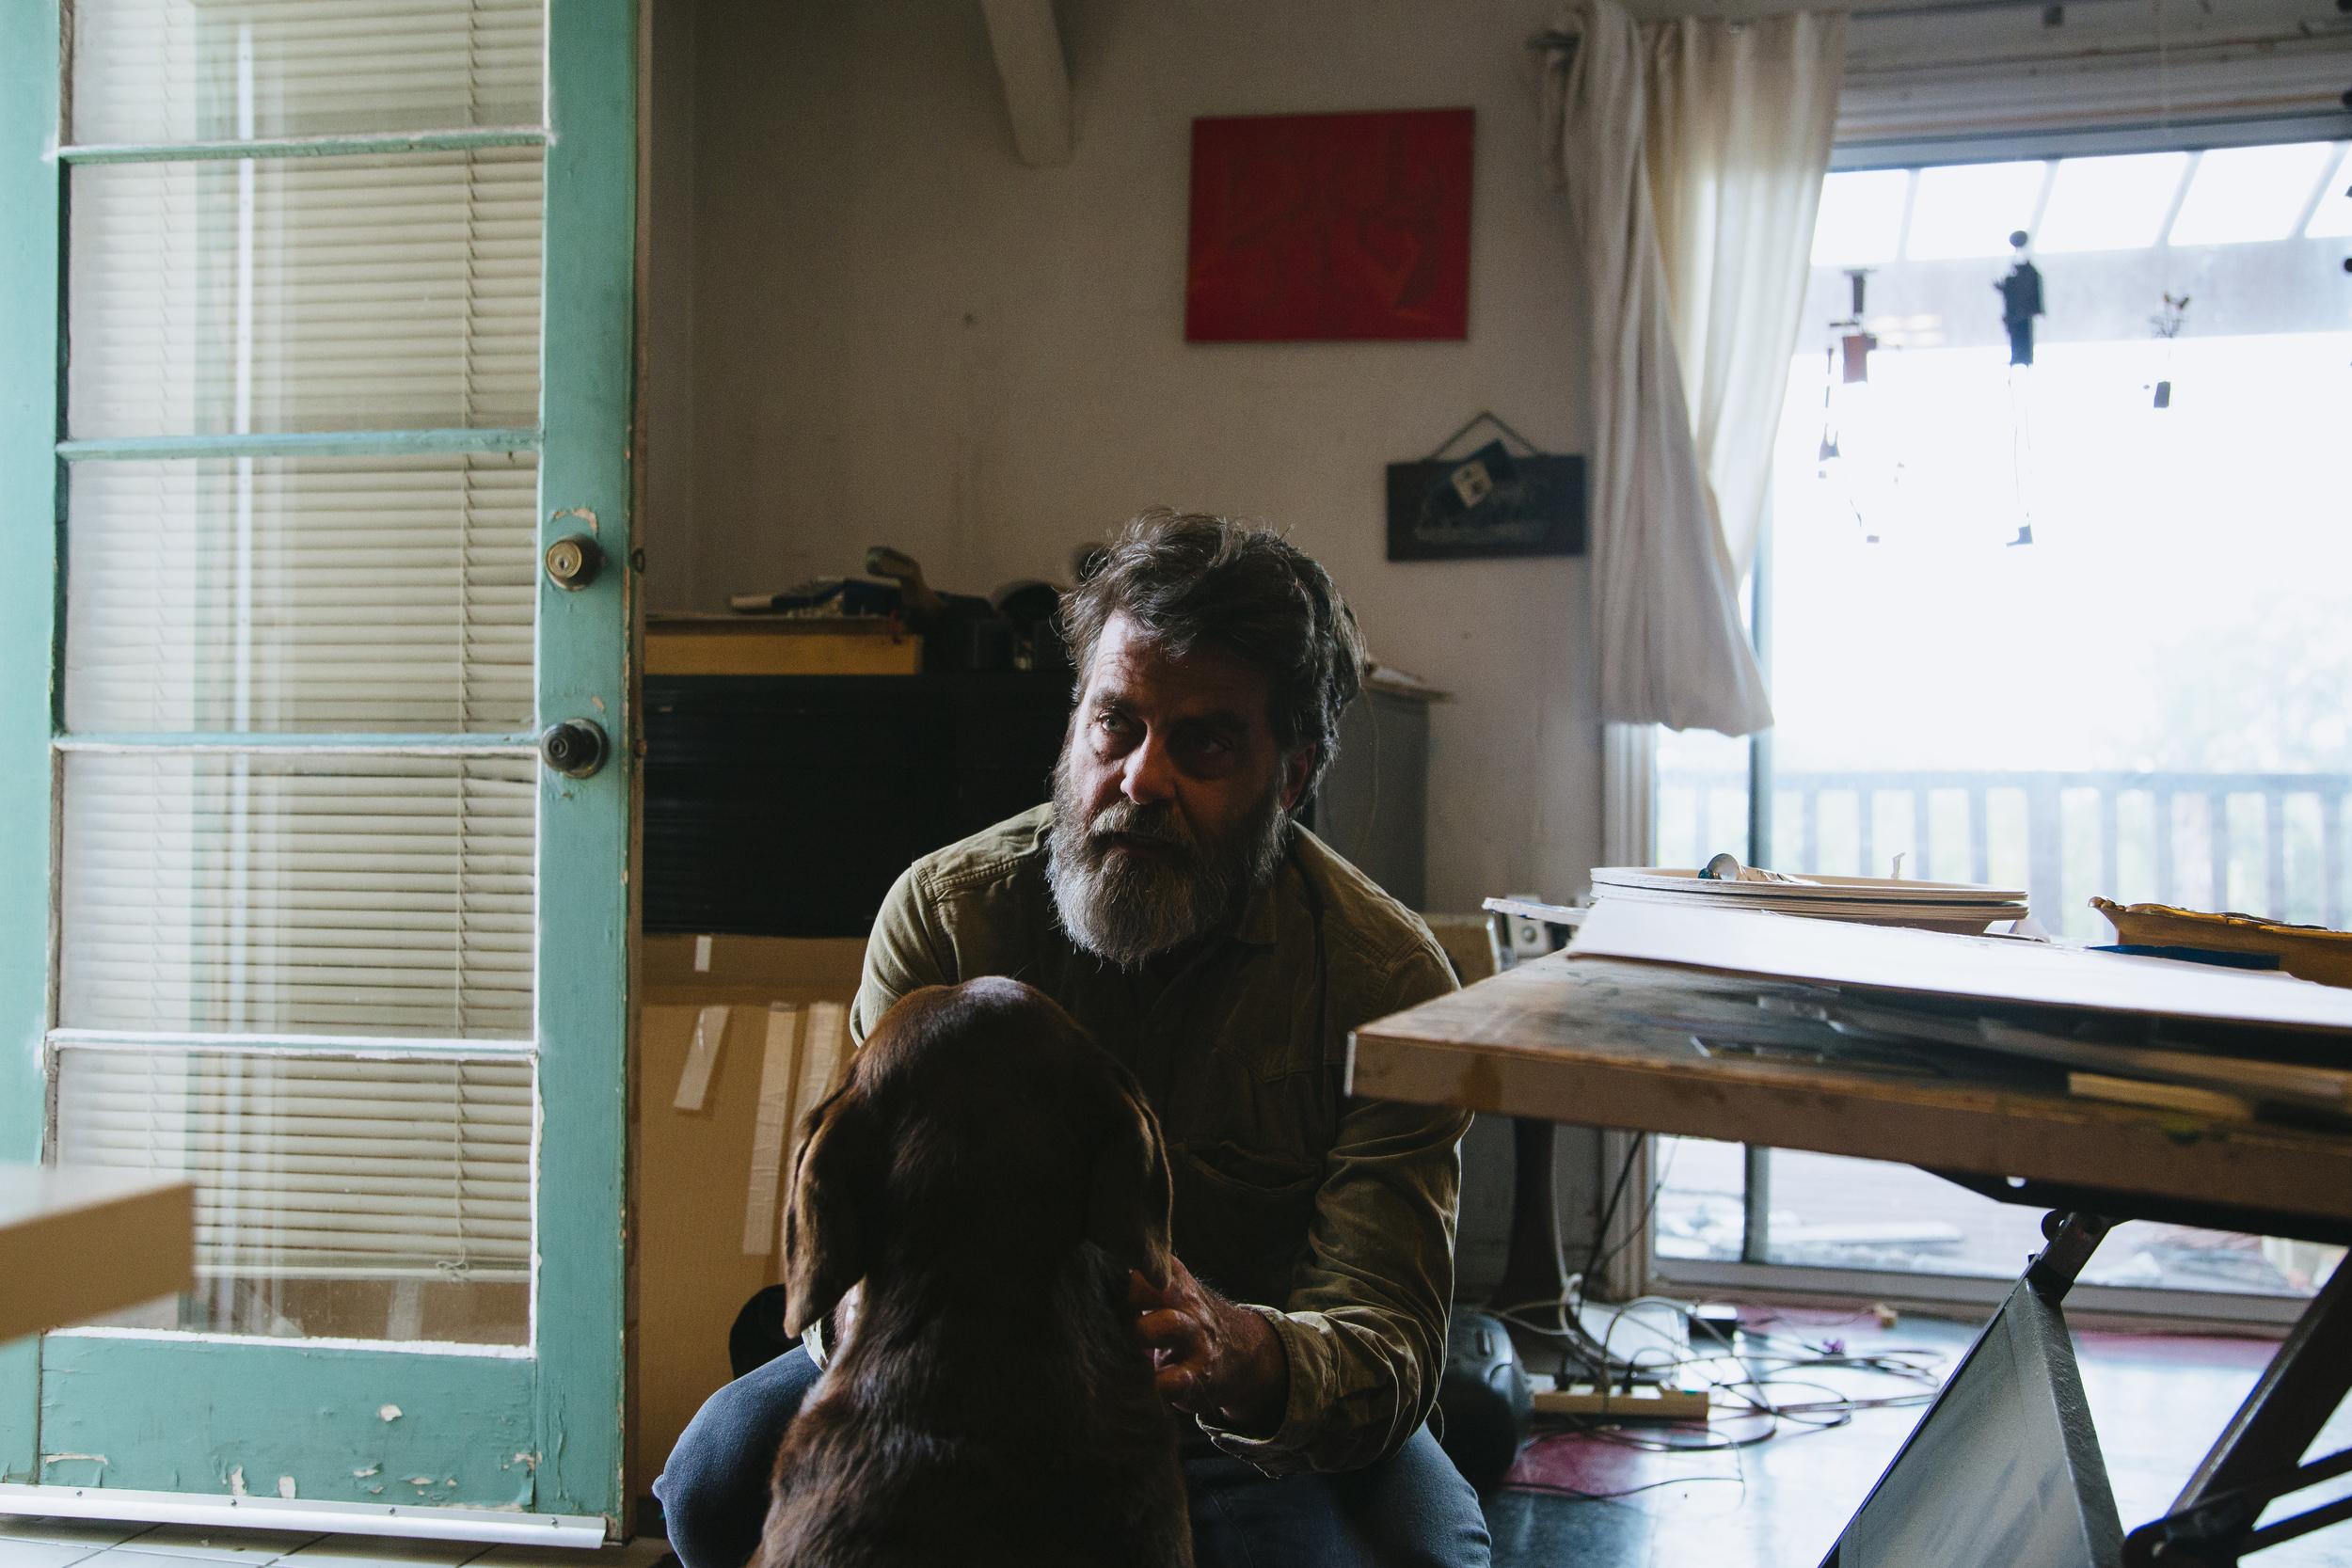 Wayne and his dog, Mabel, in his Los Angeles studio.